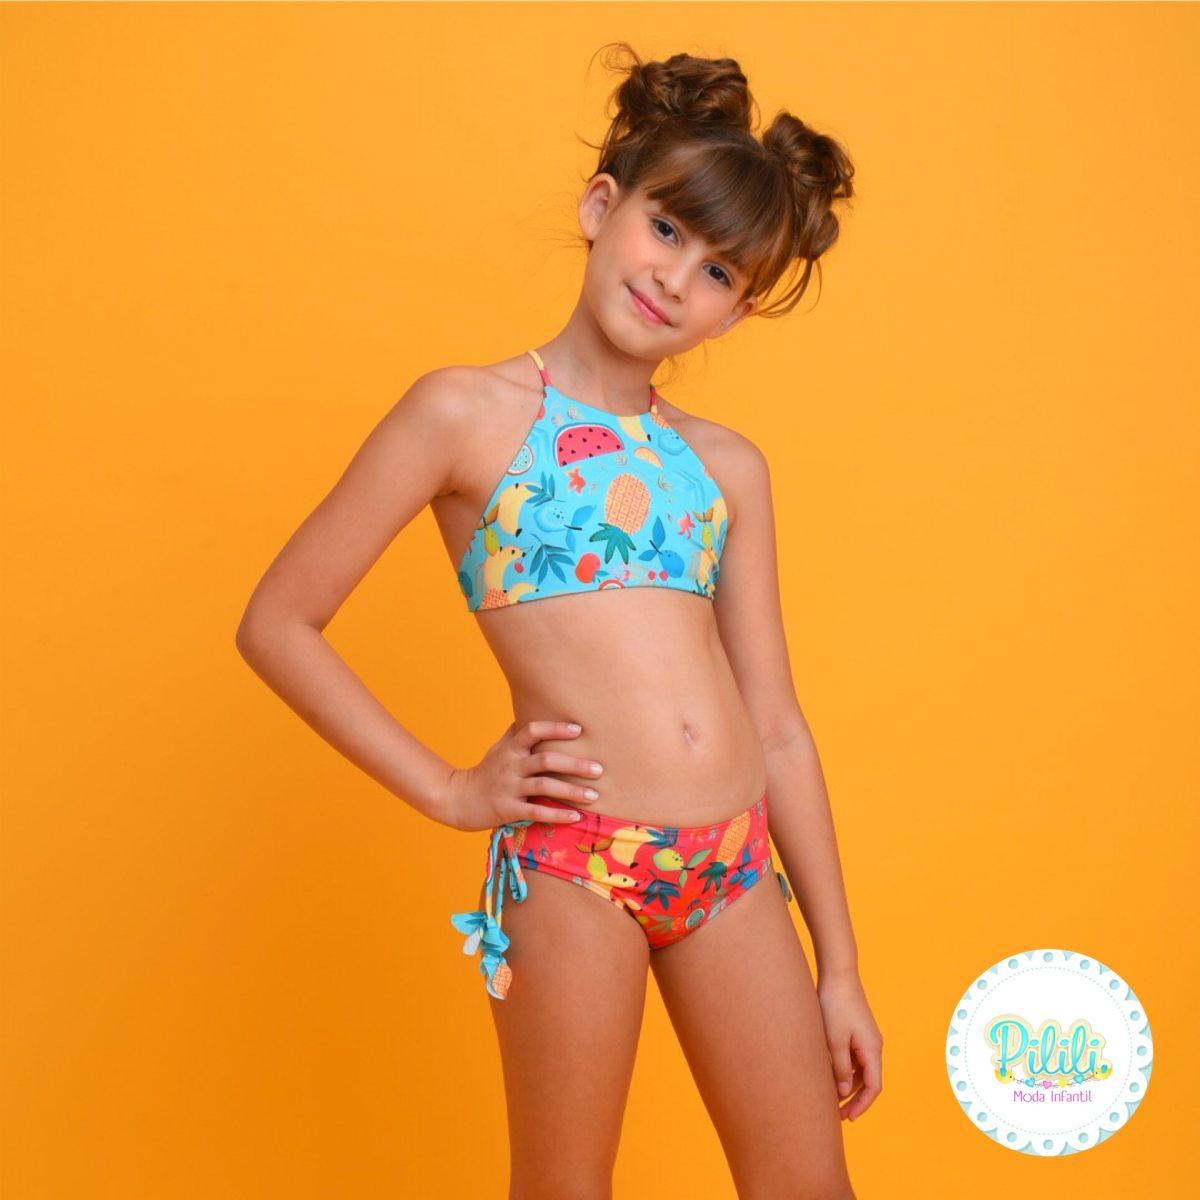 Biquini Infantil Magah Beach Wear Adriana Dupla Face Frutas